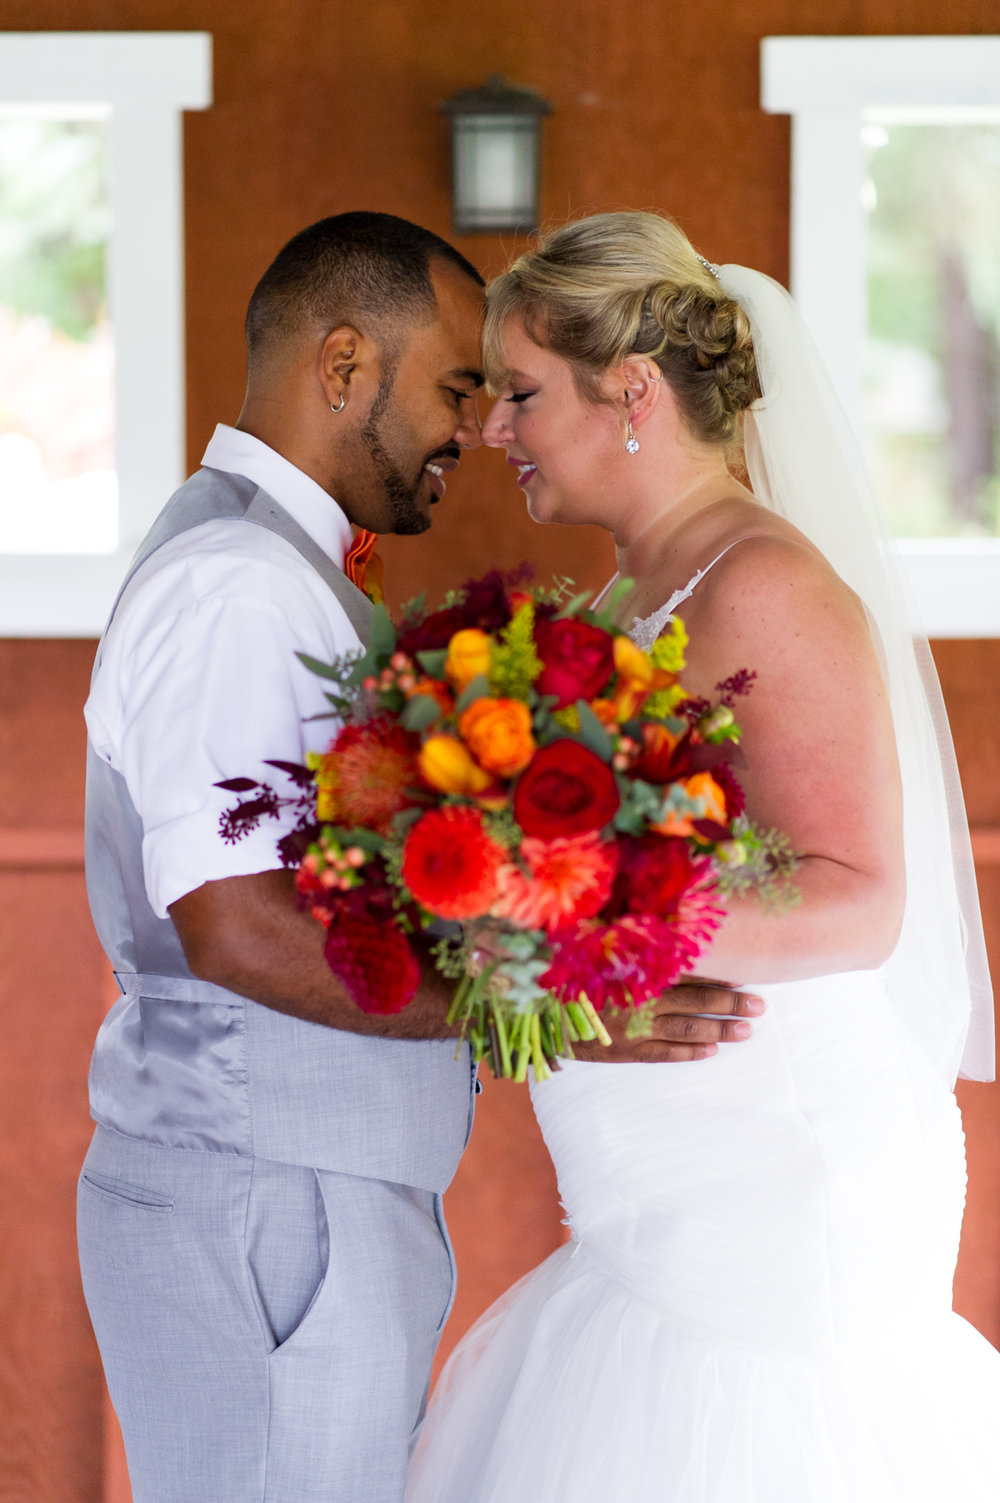 20160917_Tat_Renee and Marcus Wedding-25.jpg